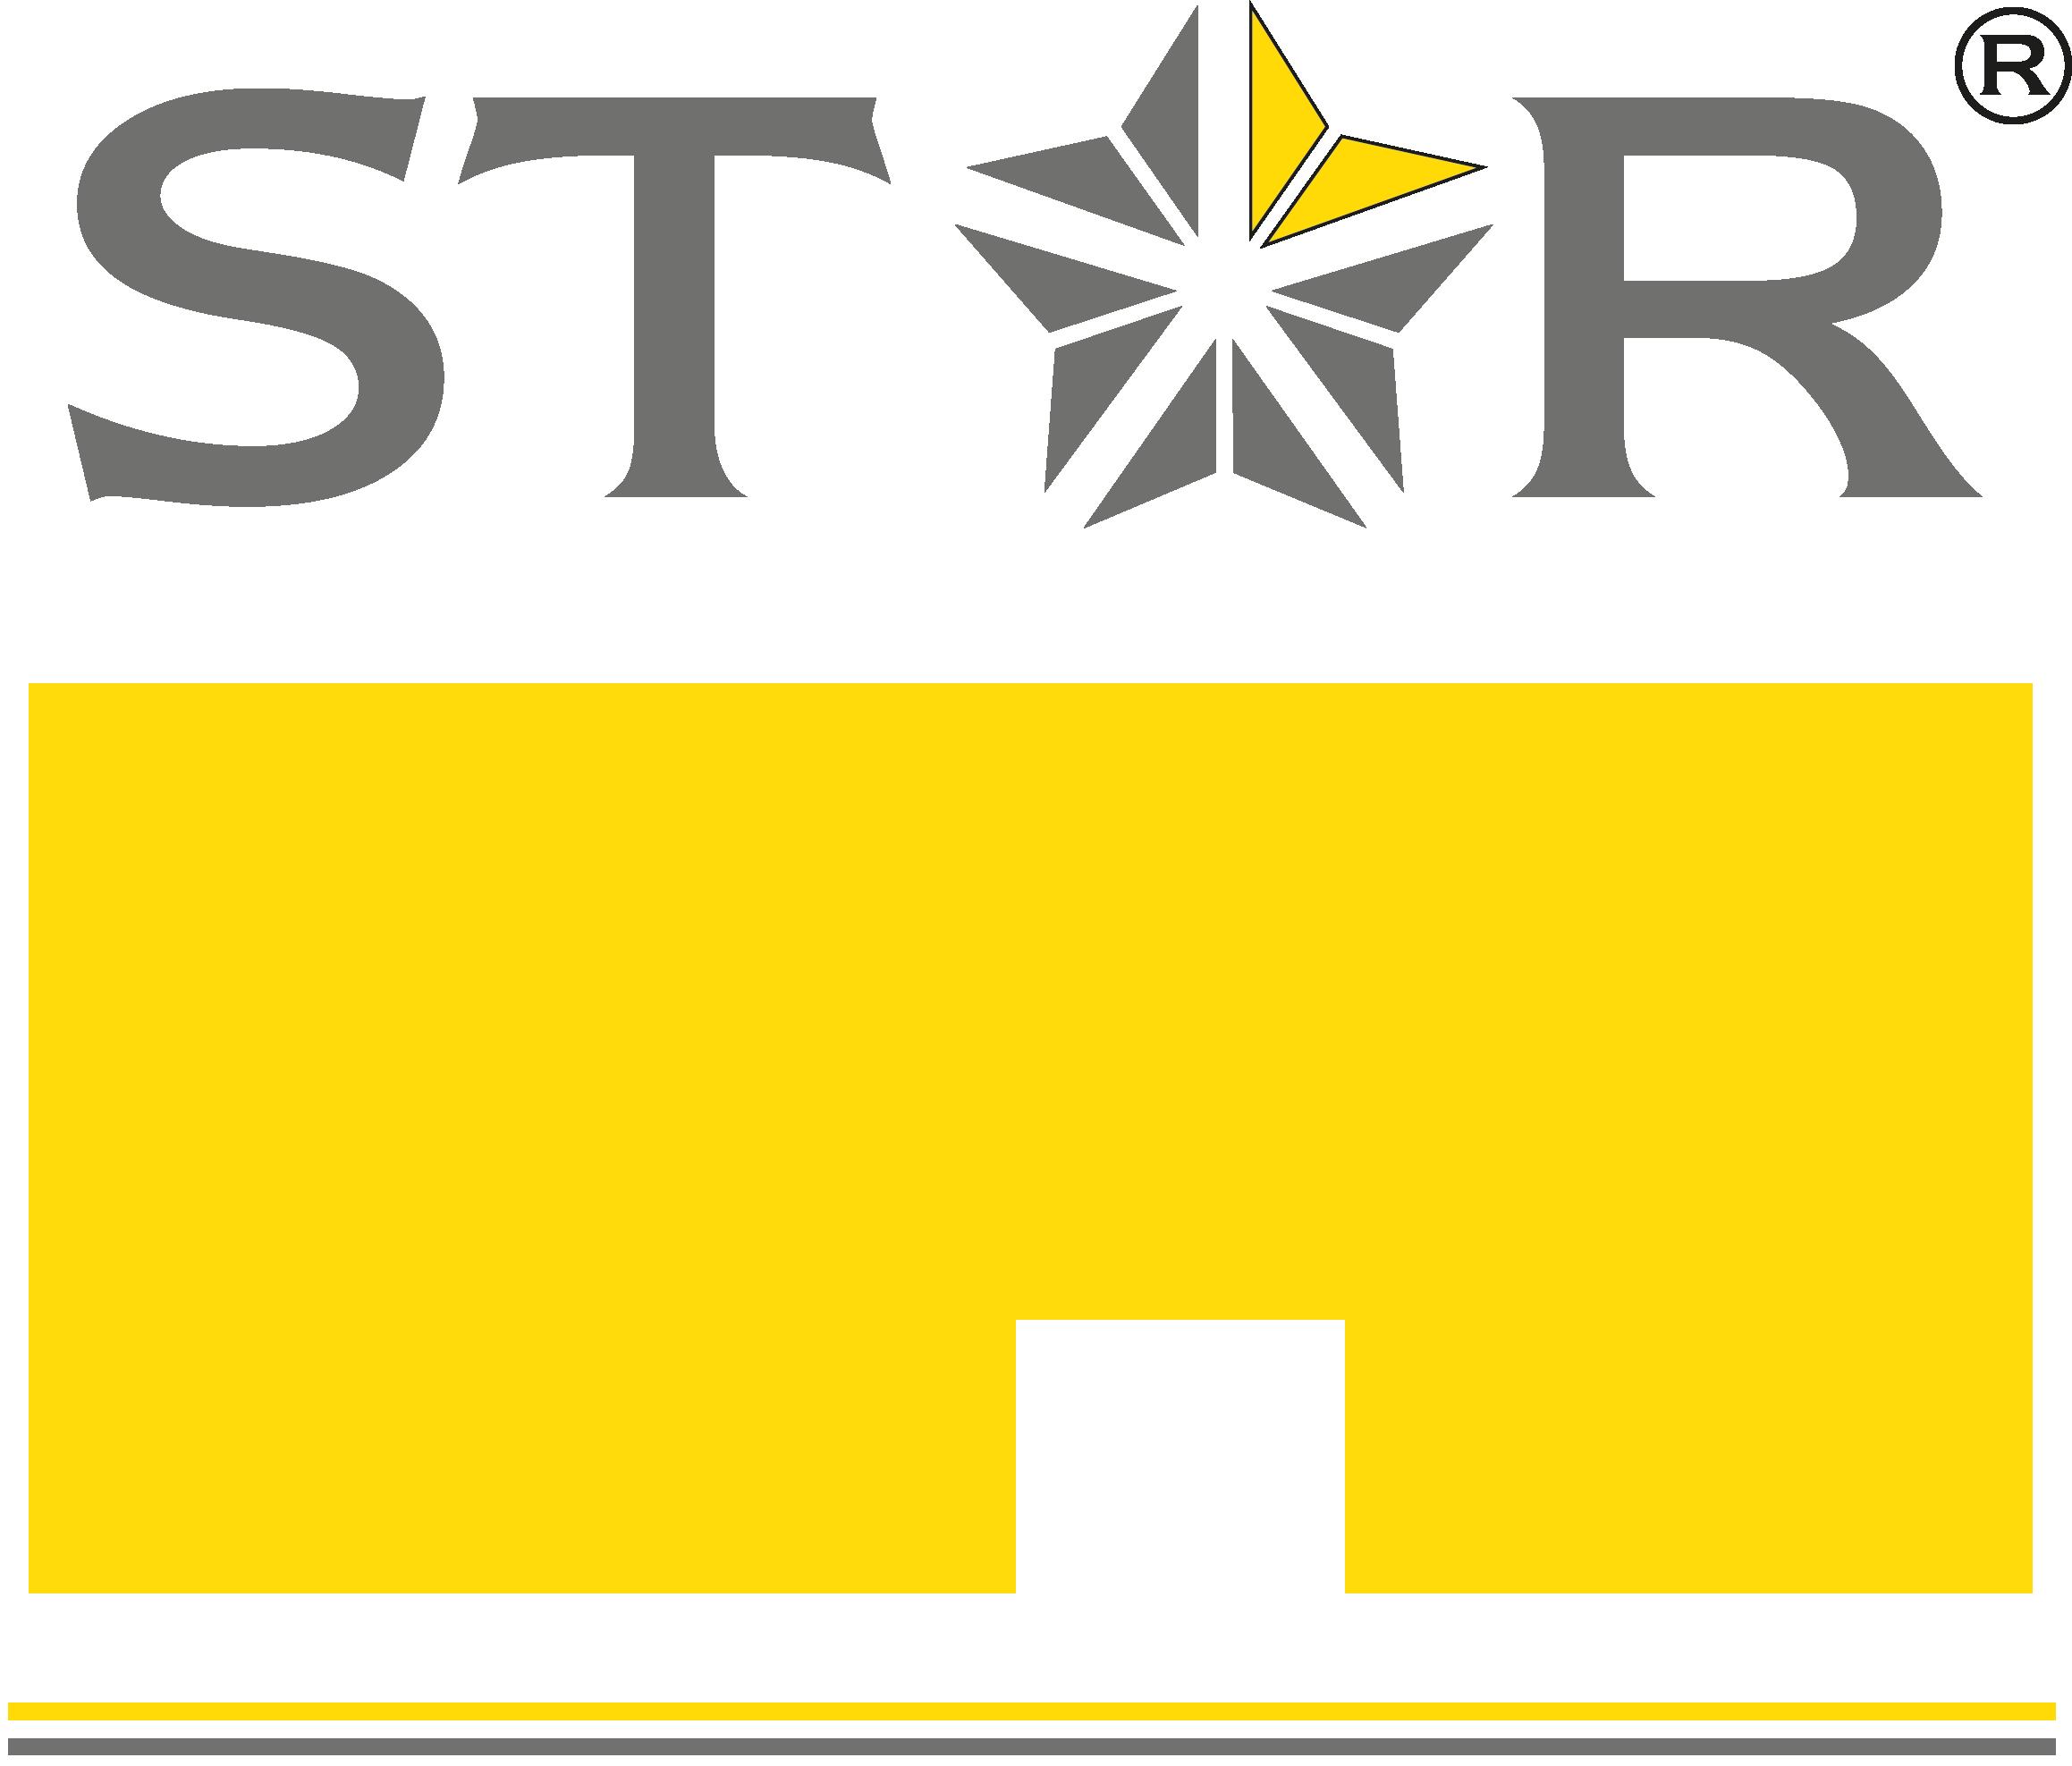 Web-logo-stargps-v2-yellow